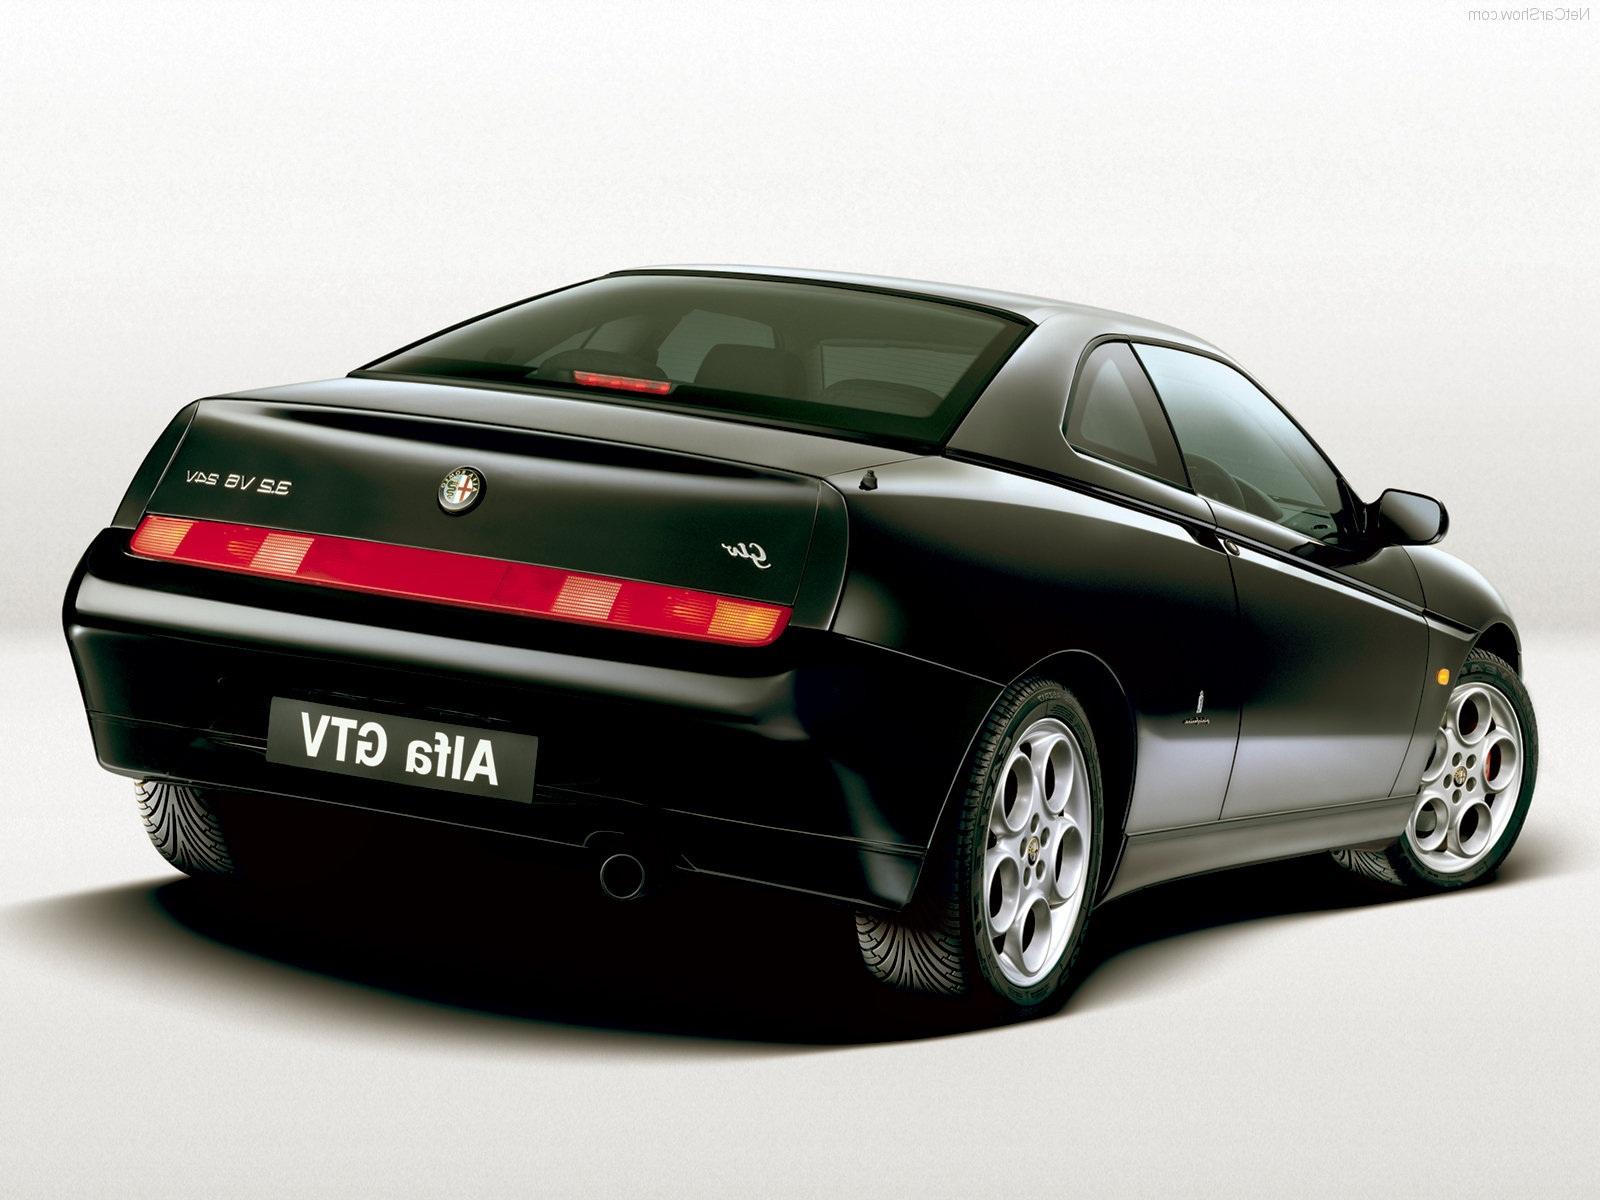 Alfa_Romeo-GTV_2003_Wallpaper1.jpg